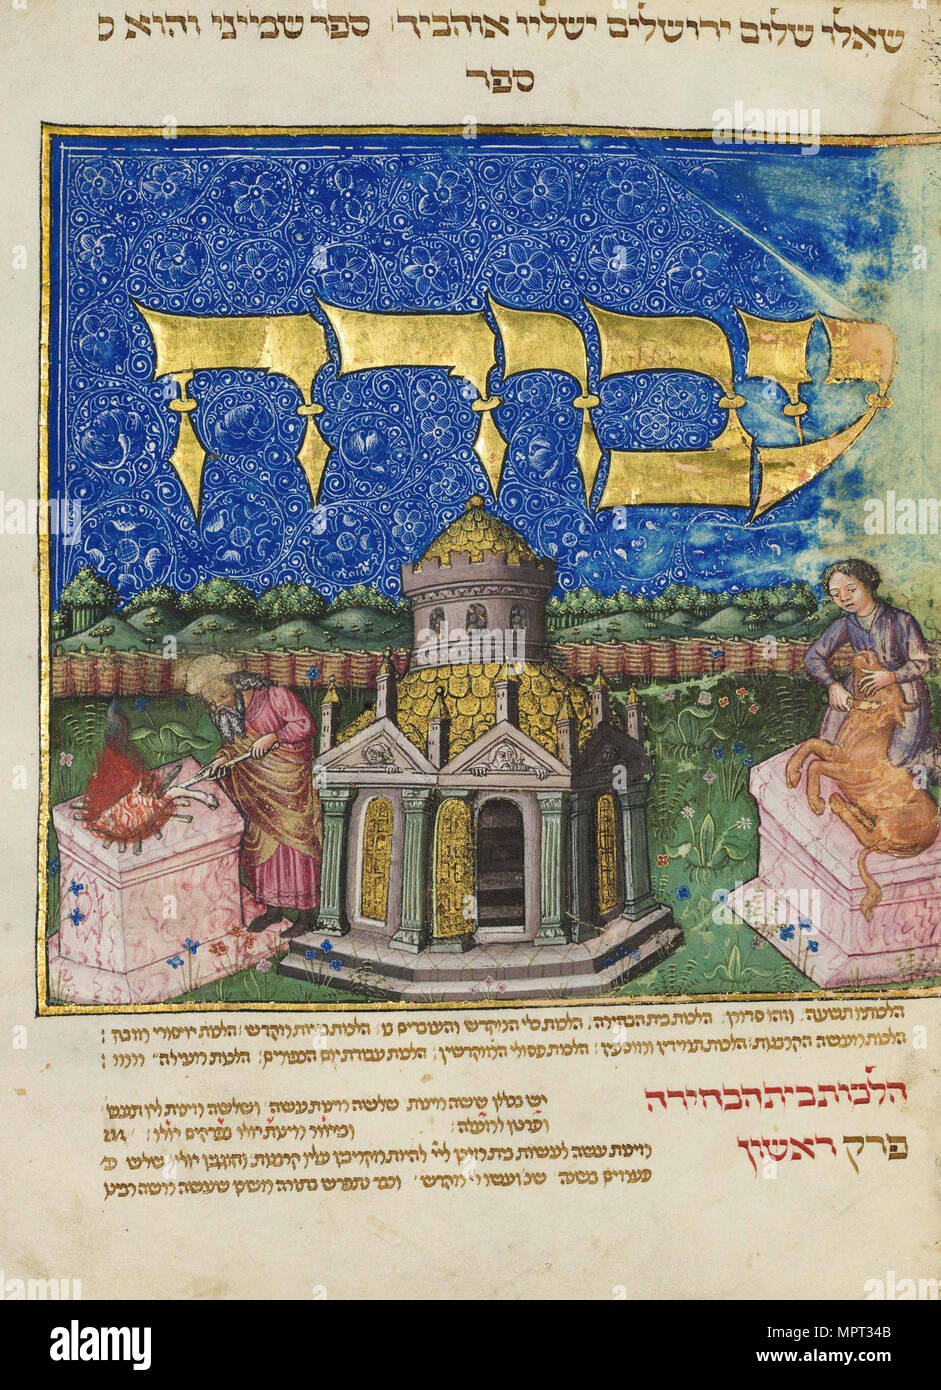 The Mishneh Torah (Repetition of the Torah), ca 1460. - Stock Image